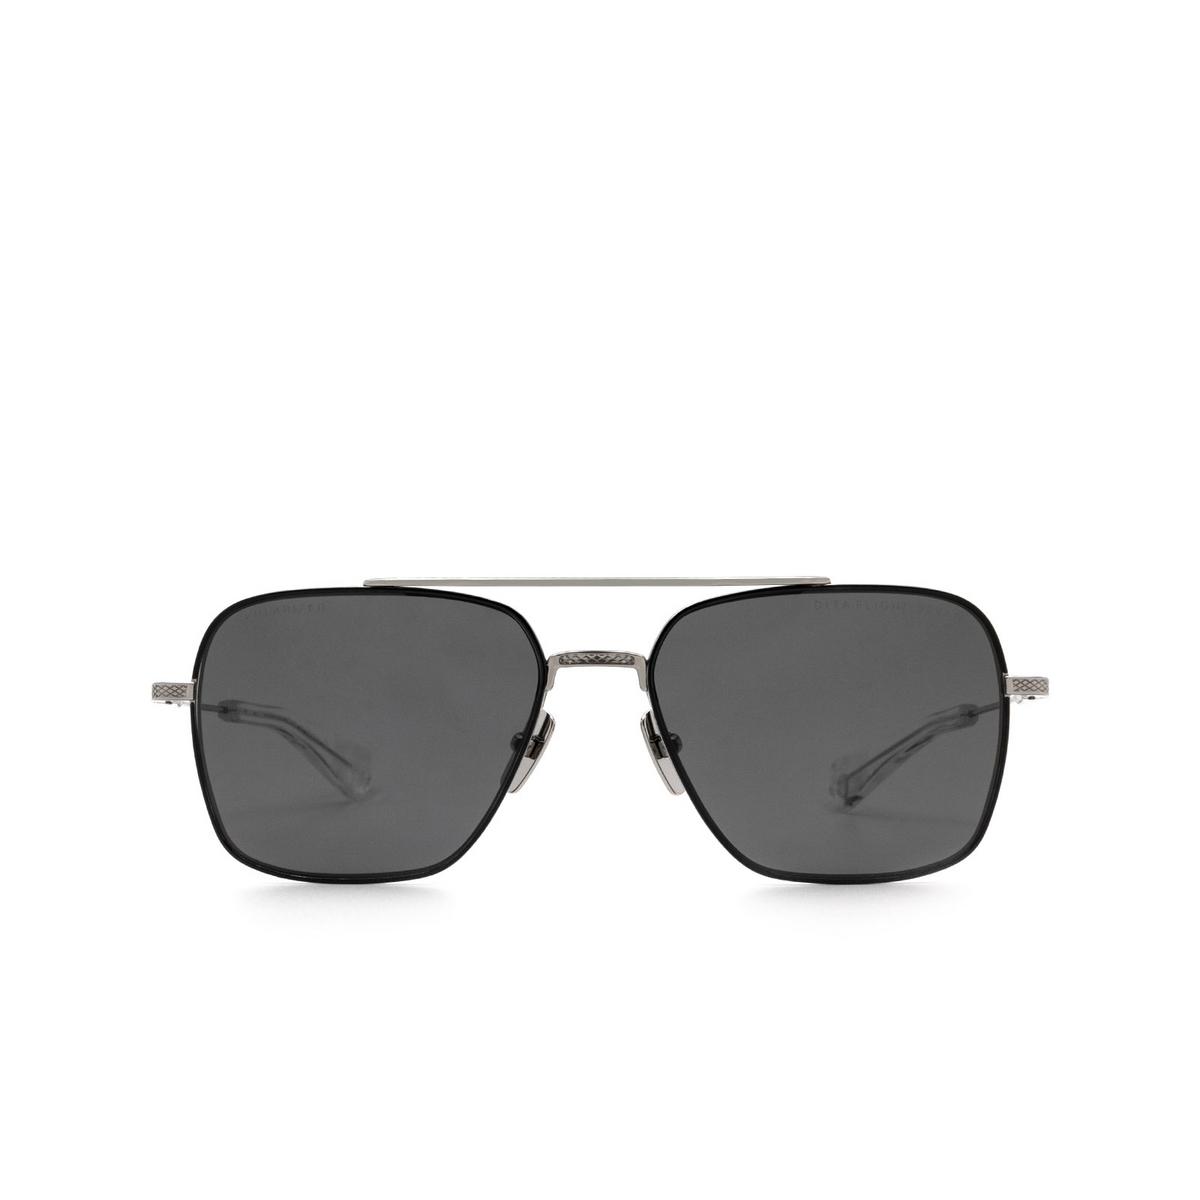 Dita® Aviator Sunglasses: DTS111-57-05-Z color Black Palladium Pld-blk.